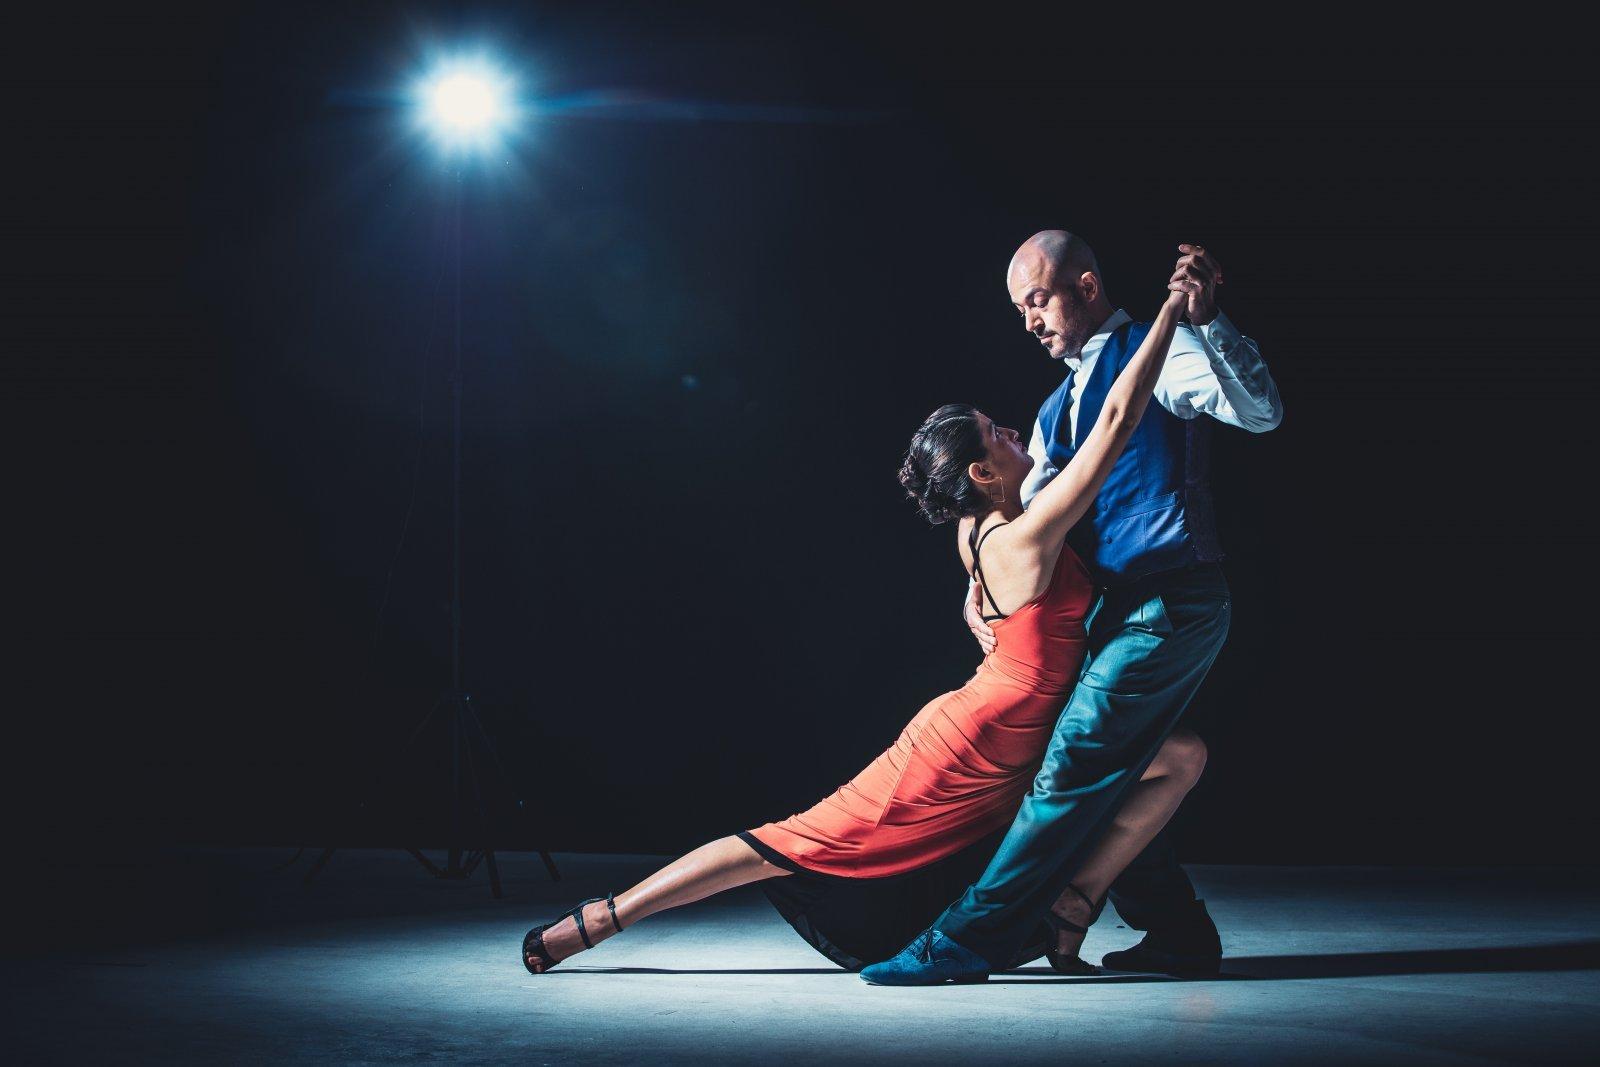 dance-dancers-dancing-2188012.jpg